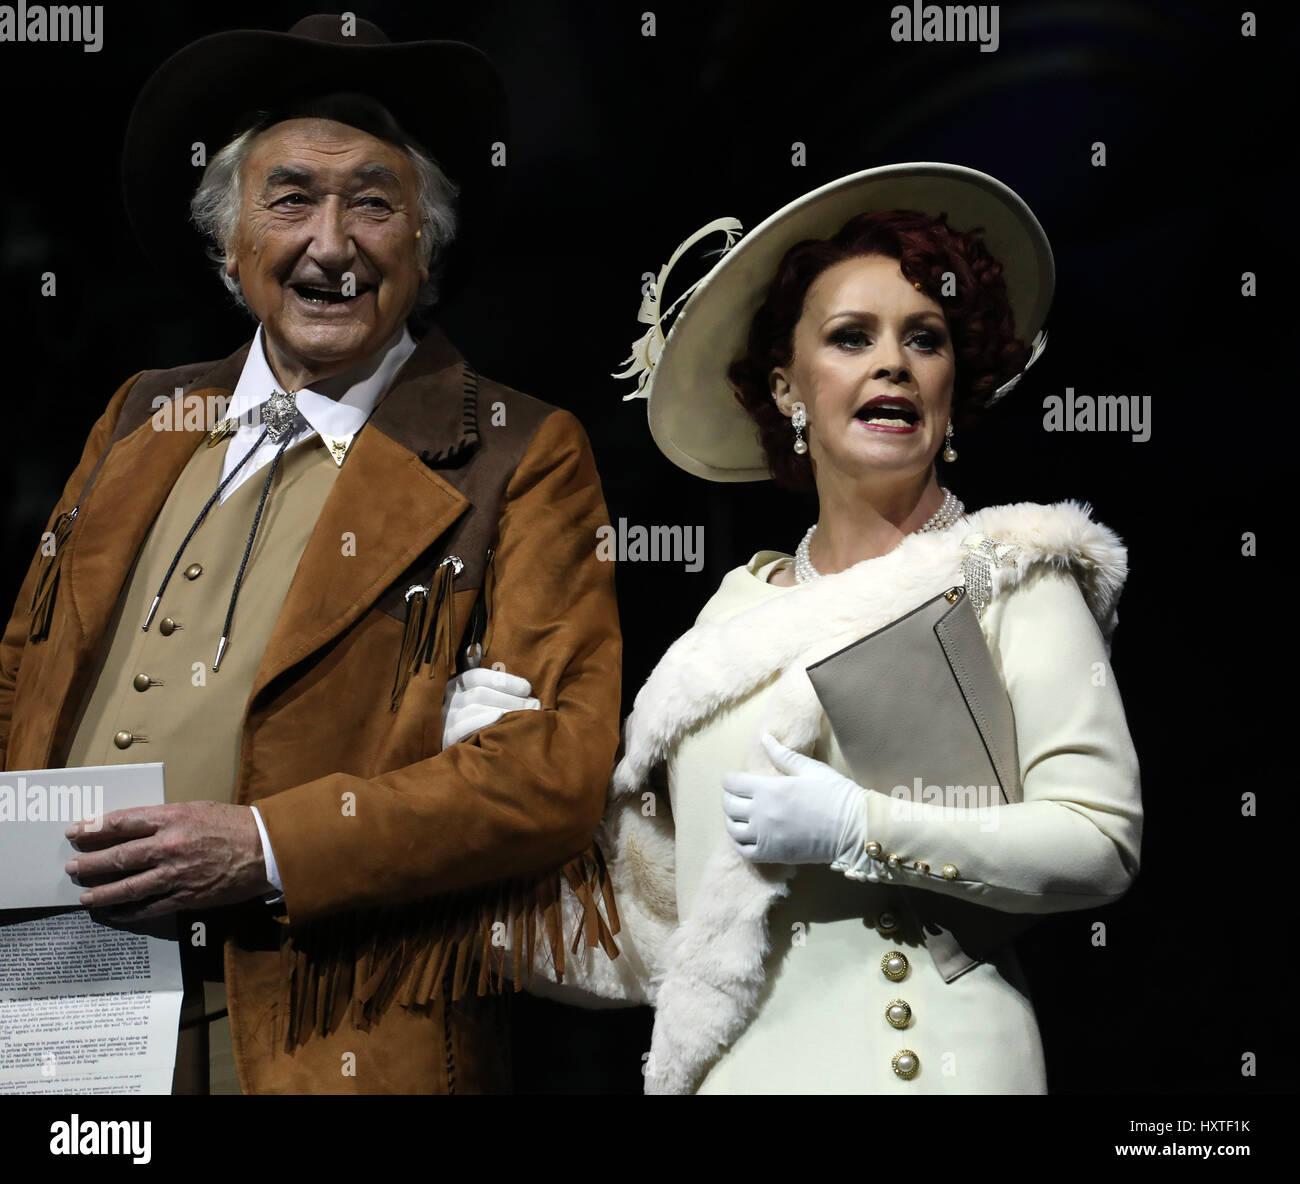 London, UK. 30th Mar, 2017. Pic shows: 42nd Street show at Theatre Royal Drury Lane starring Sheena Easton as Dorothy - Stock Image